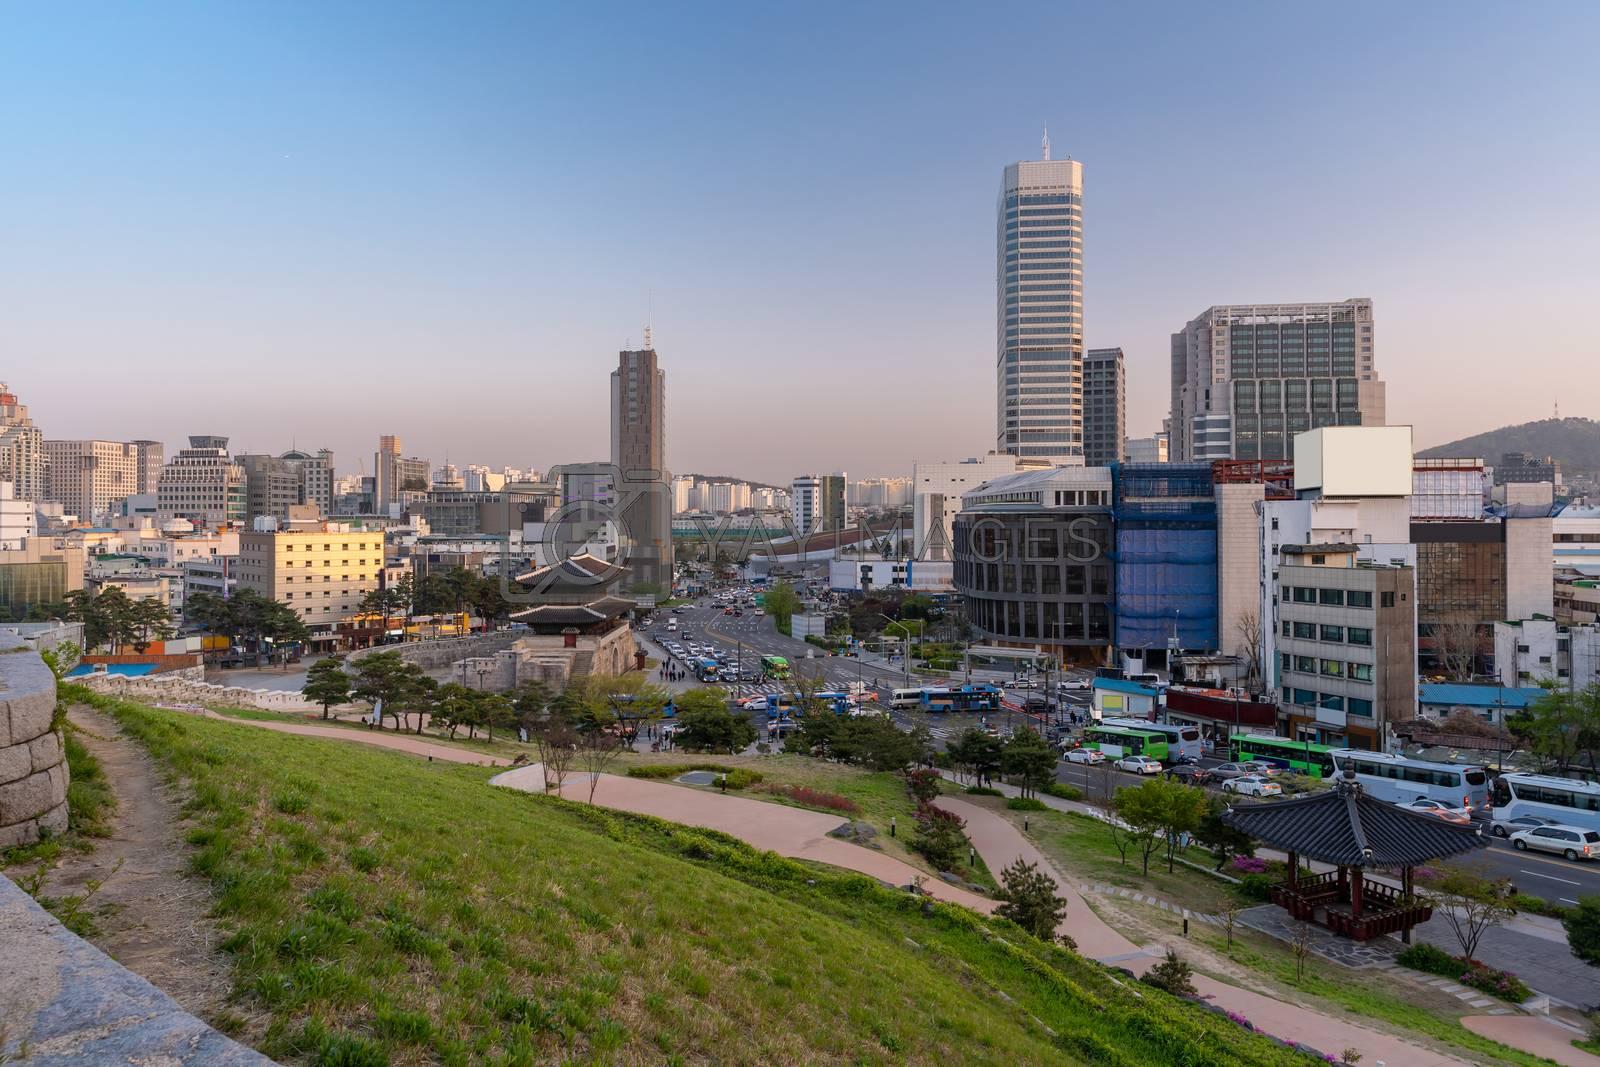 Cityscape at Heunginjimun Dongdaemun gate in Seoul South Korea